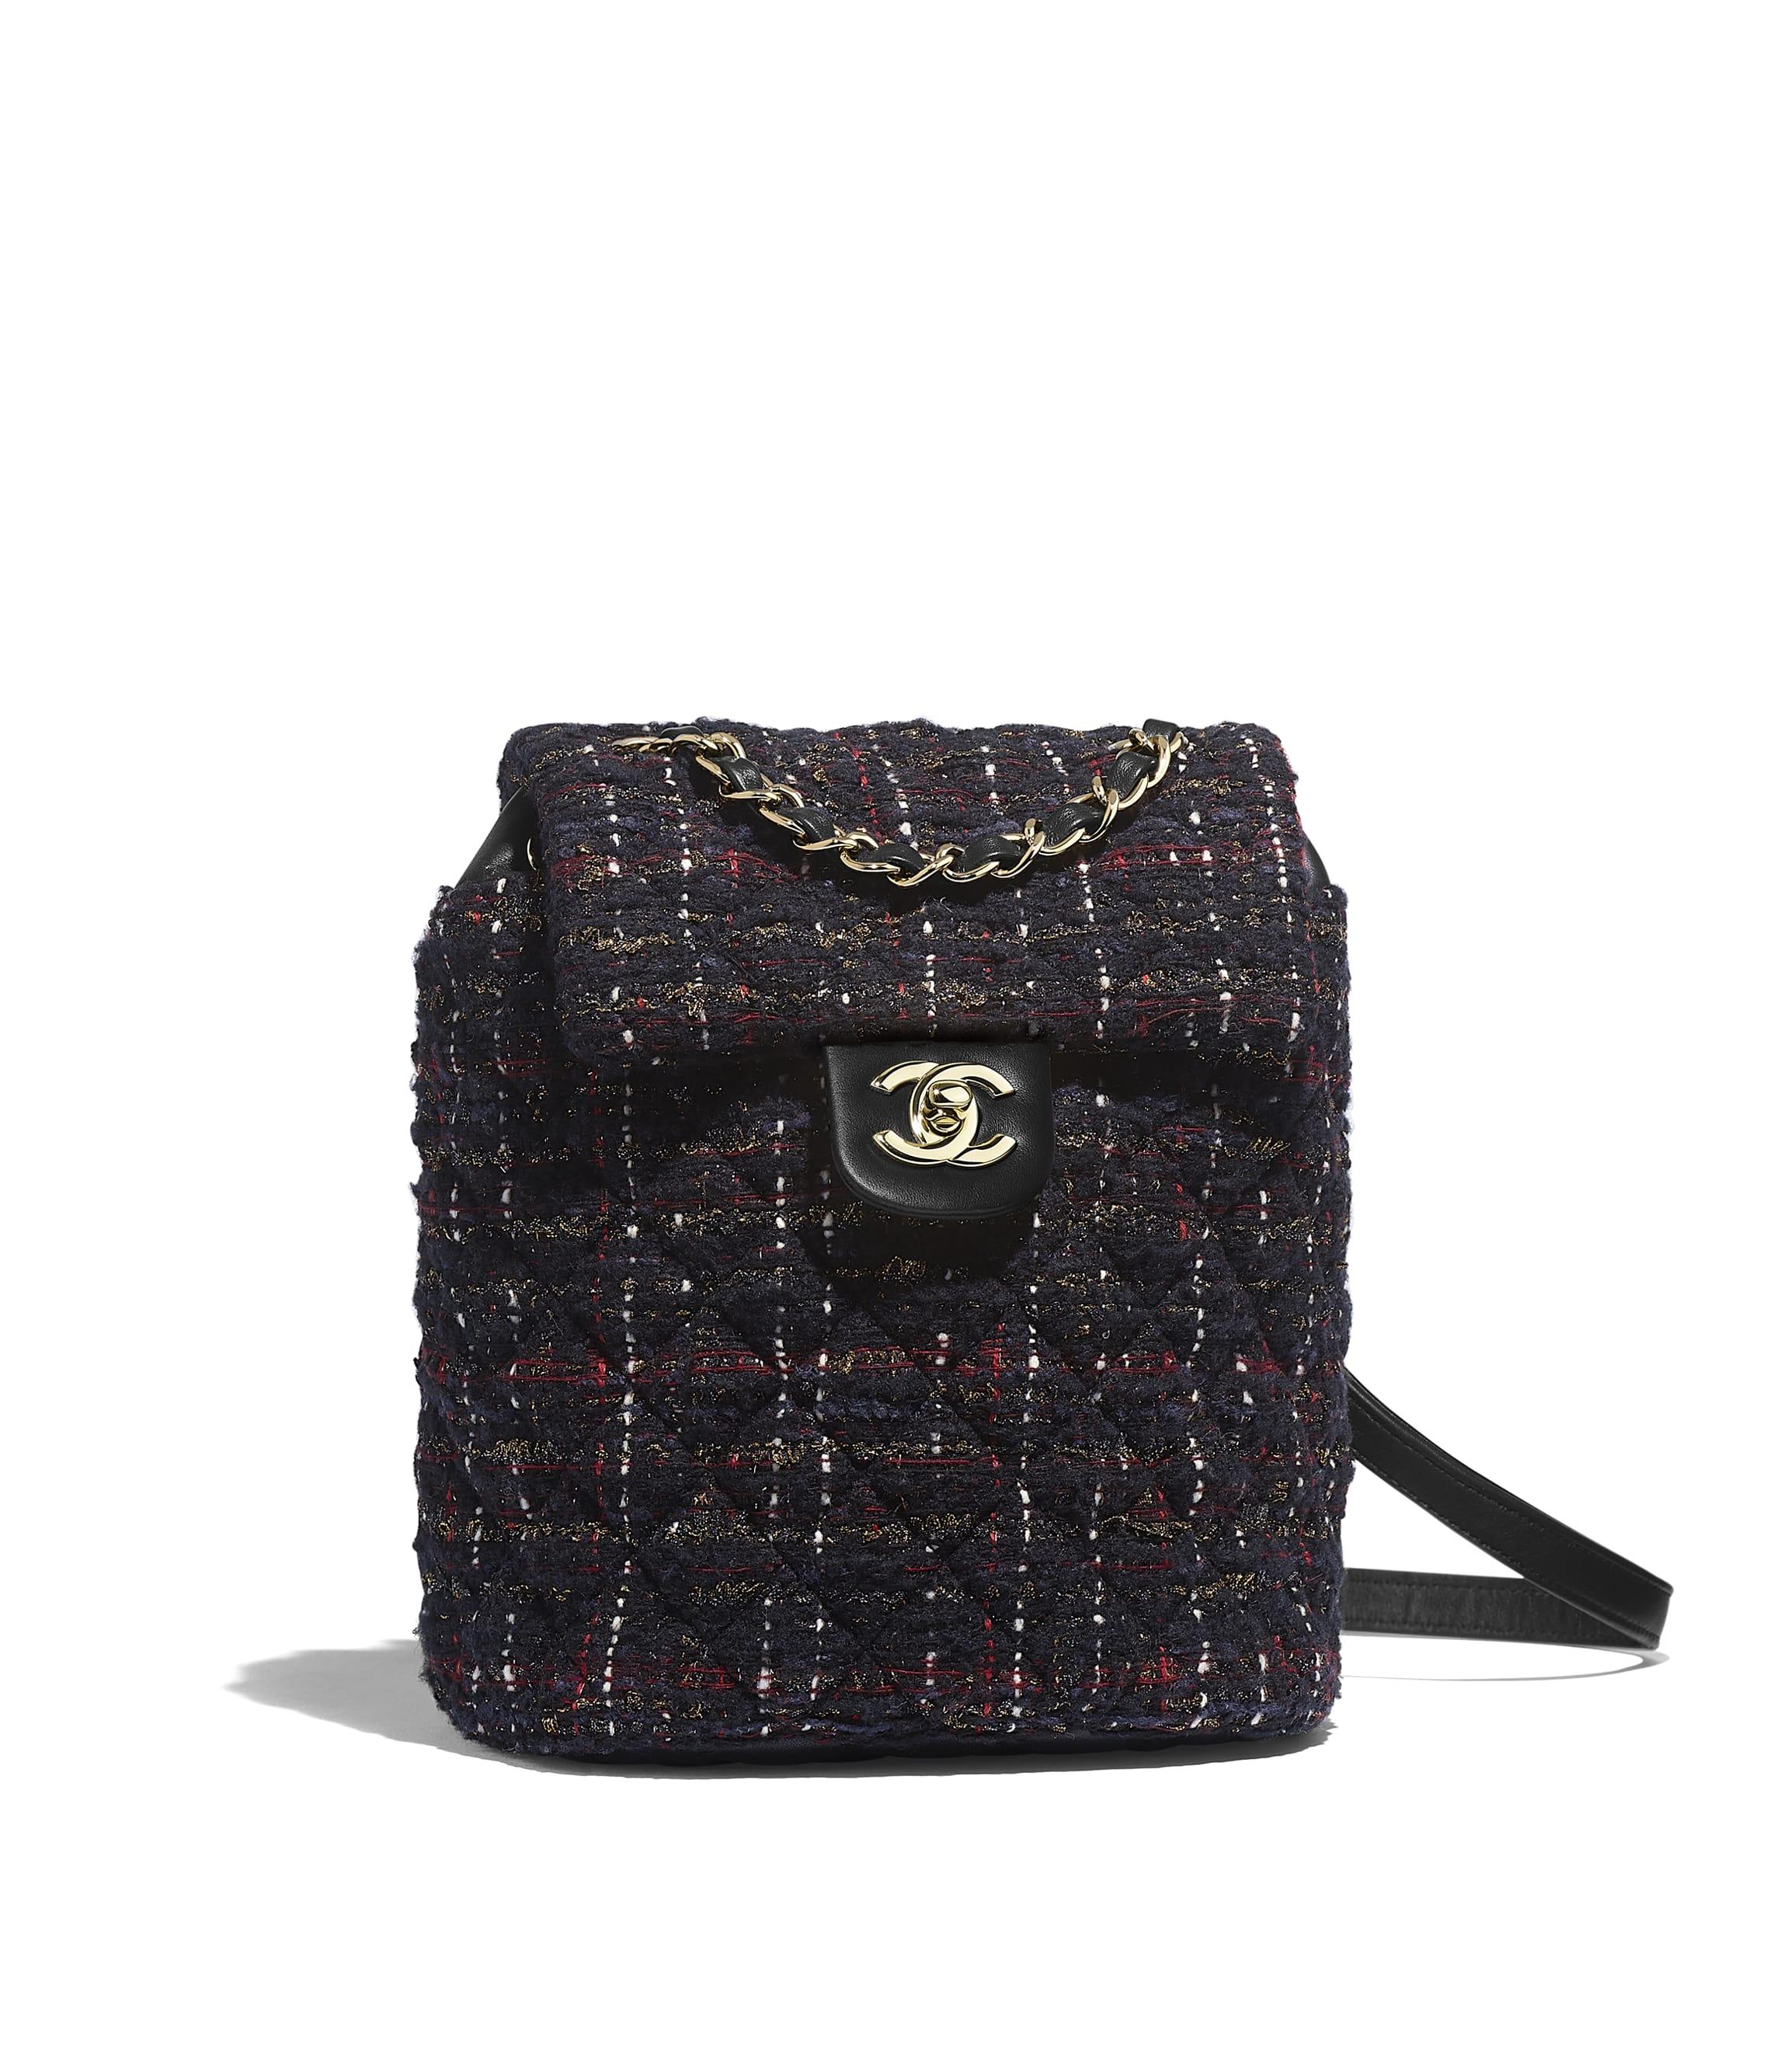 2dd4377c1c48 Backpacks - Handbags - CHANEL